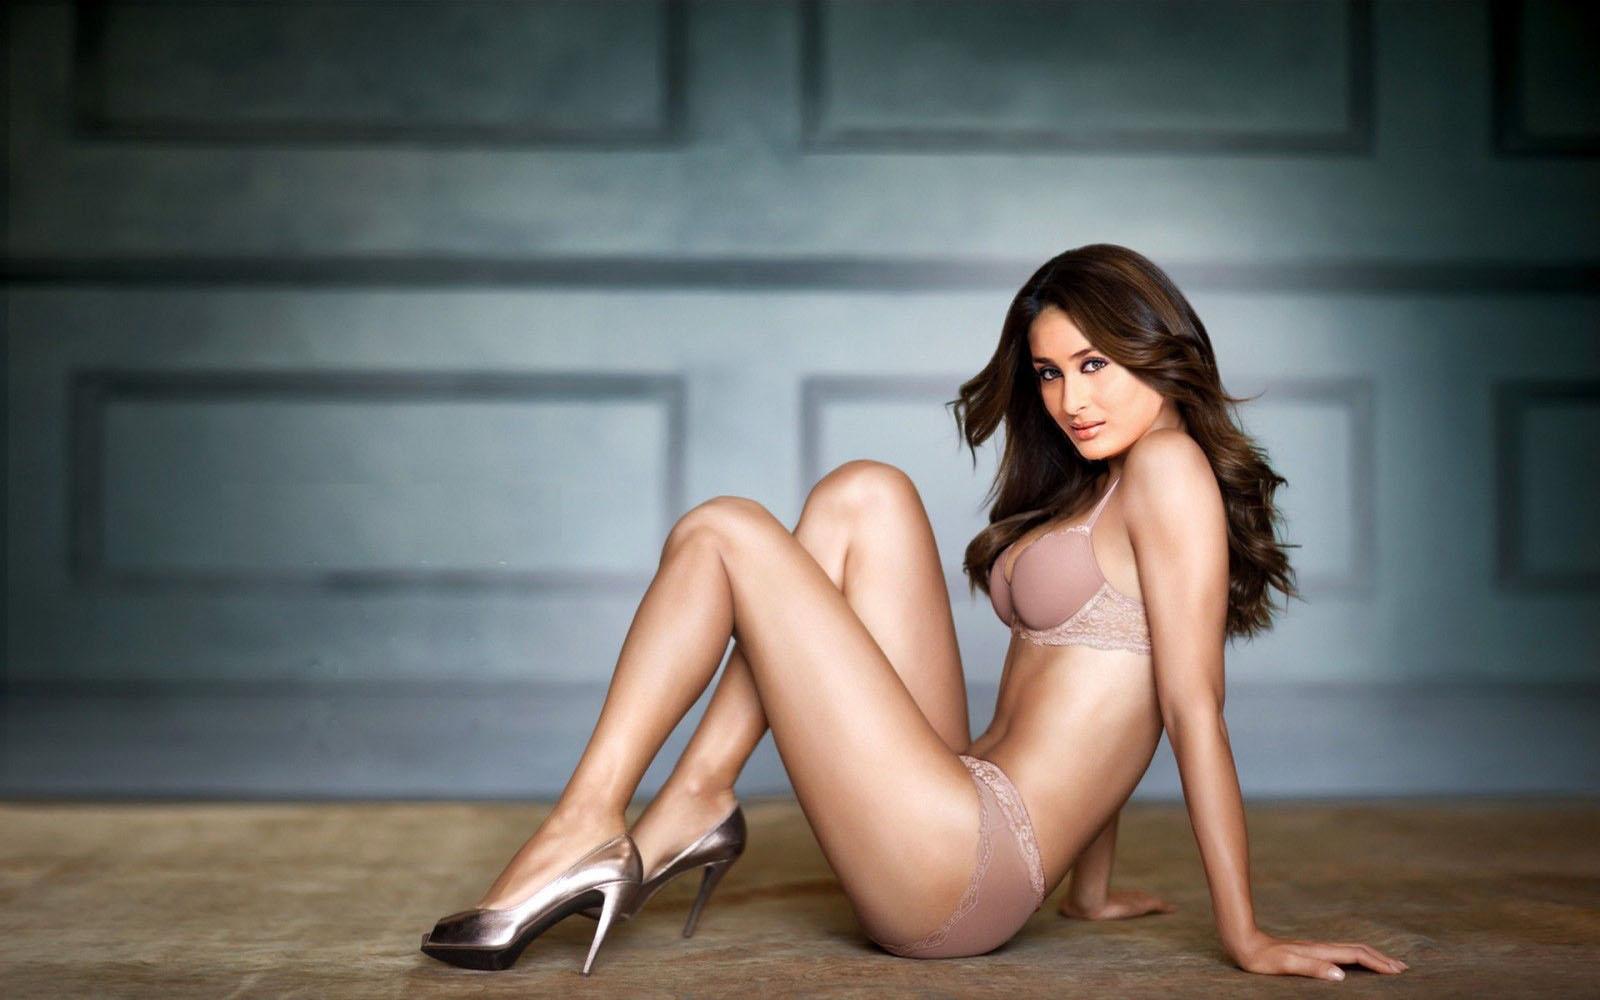 http://4.bp.blogspot.com/-XLmj1fU00b0/TlGaDbqk_ZI/AAAAAAAAA3Q/NU7DSGRsyg8/s1600/Kareena_Kapoor_Actress_Free_Download_High_Resolution_HD_HQ_Face_Wallpapers_559041.jpg